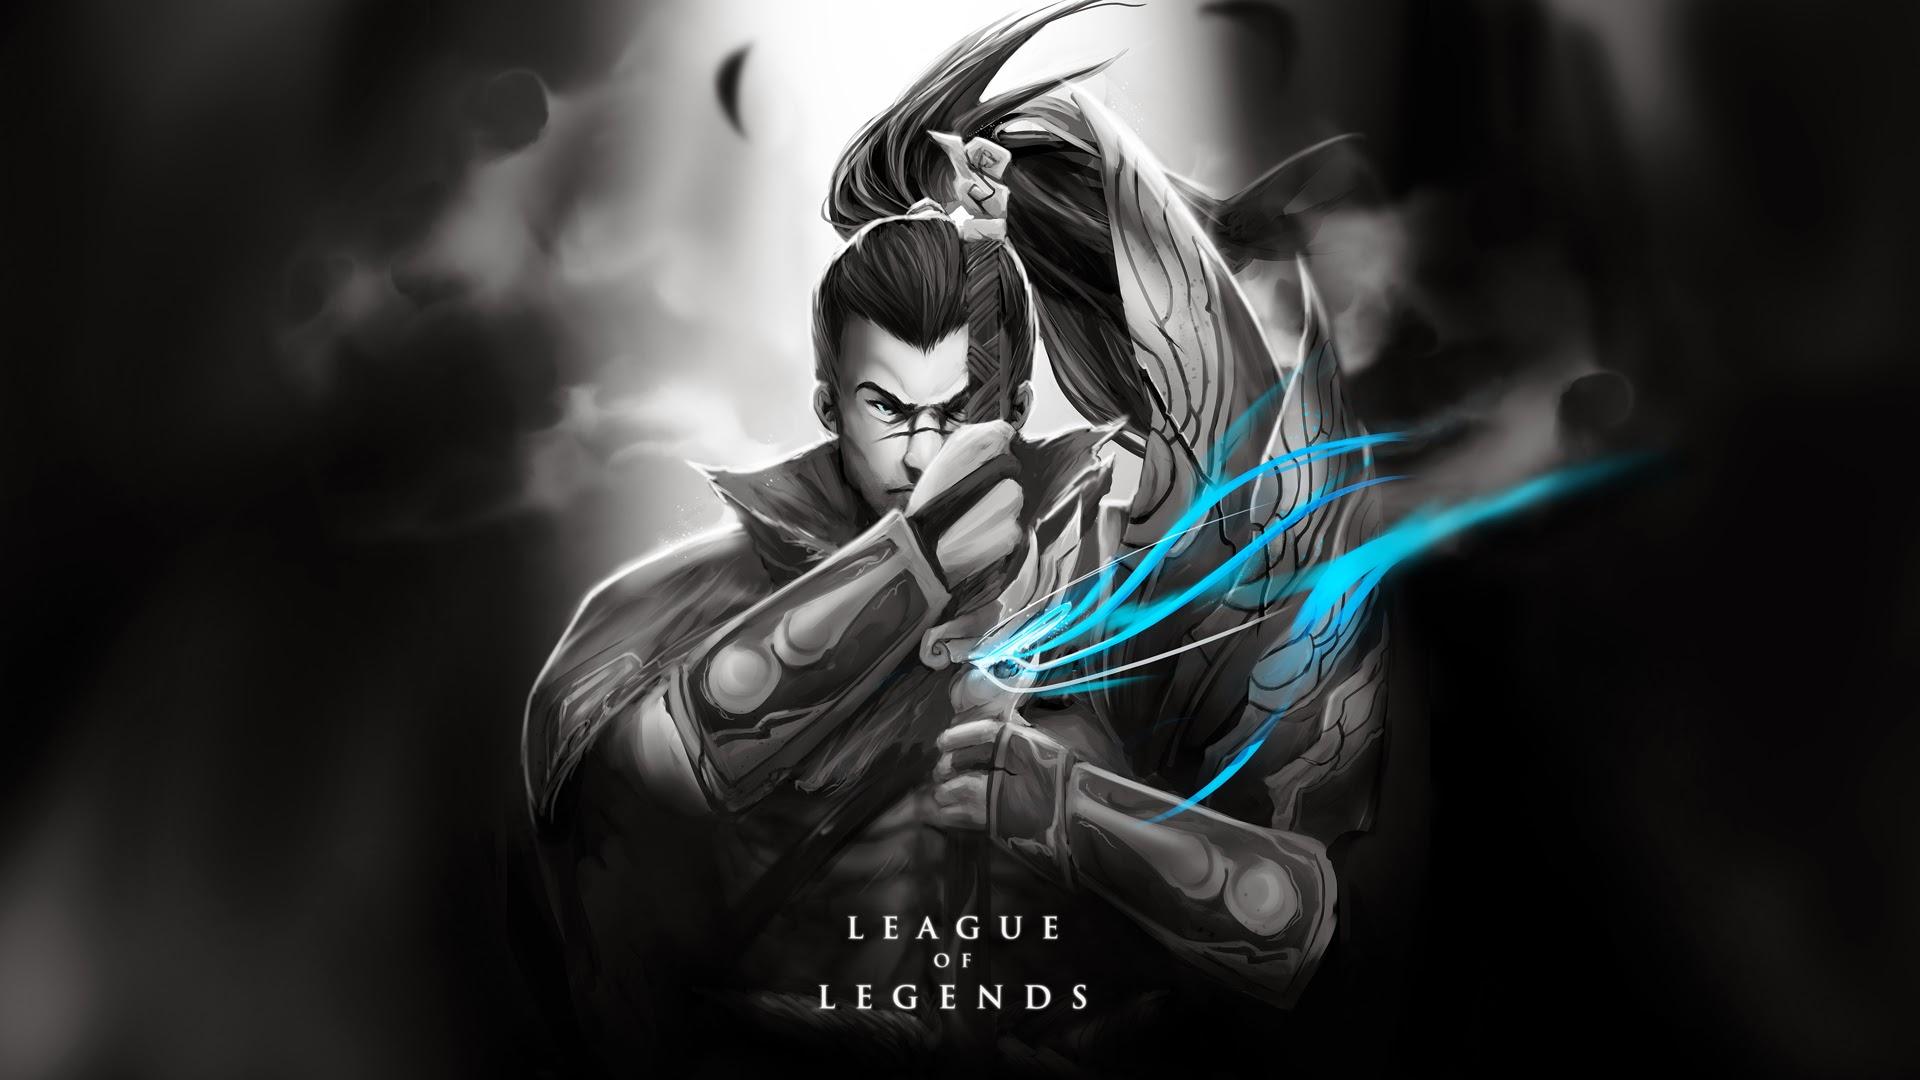 yasuo league of legends hd wallpaper lol champion 1920x1080 7j 1920x1080